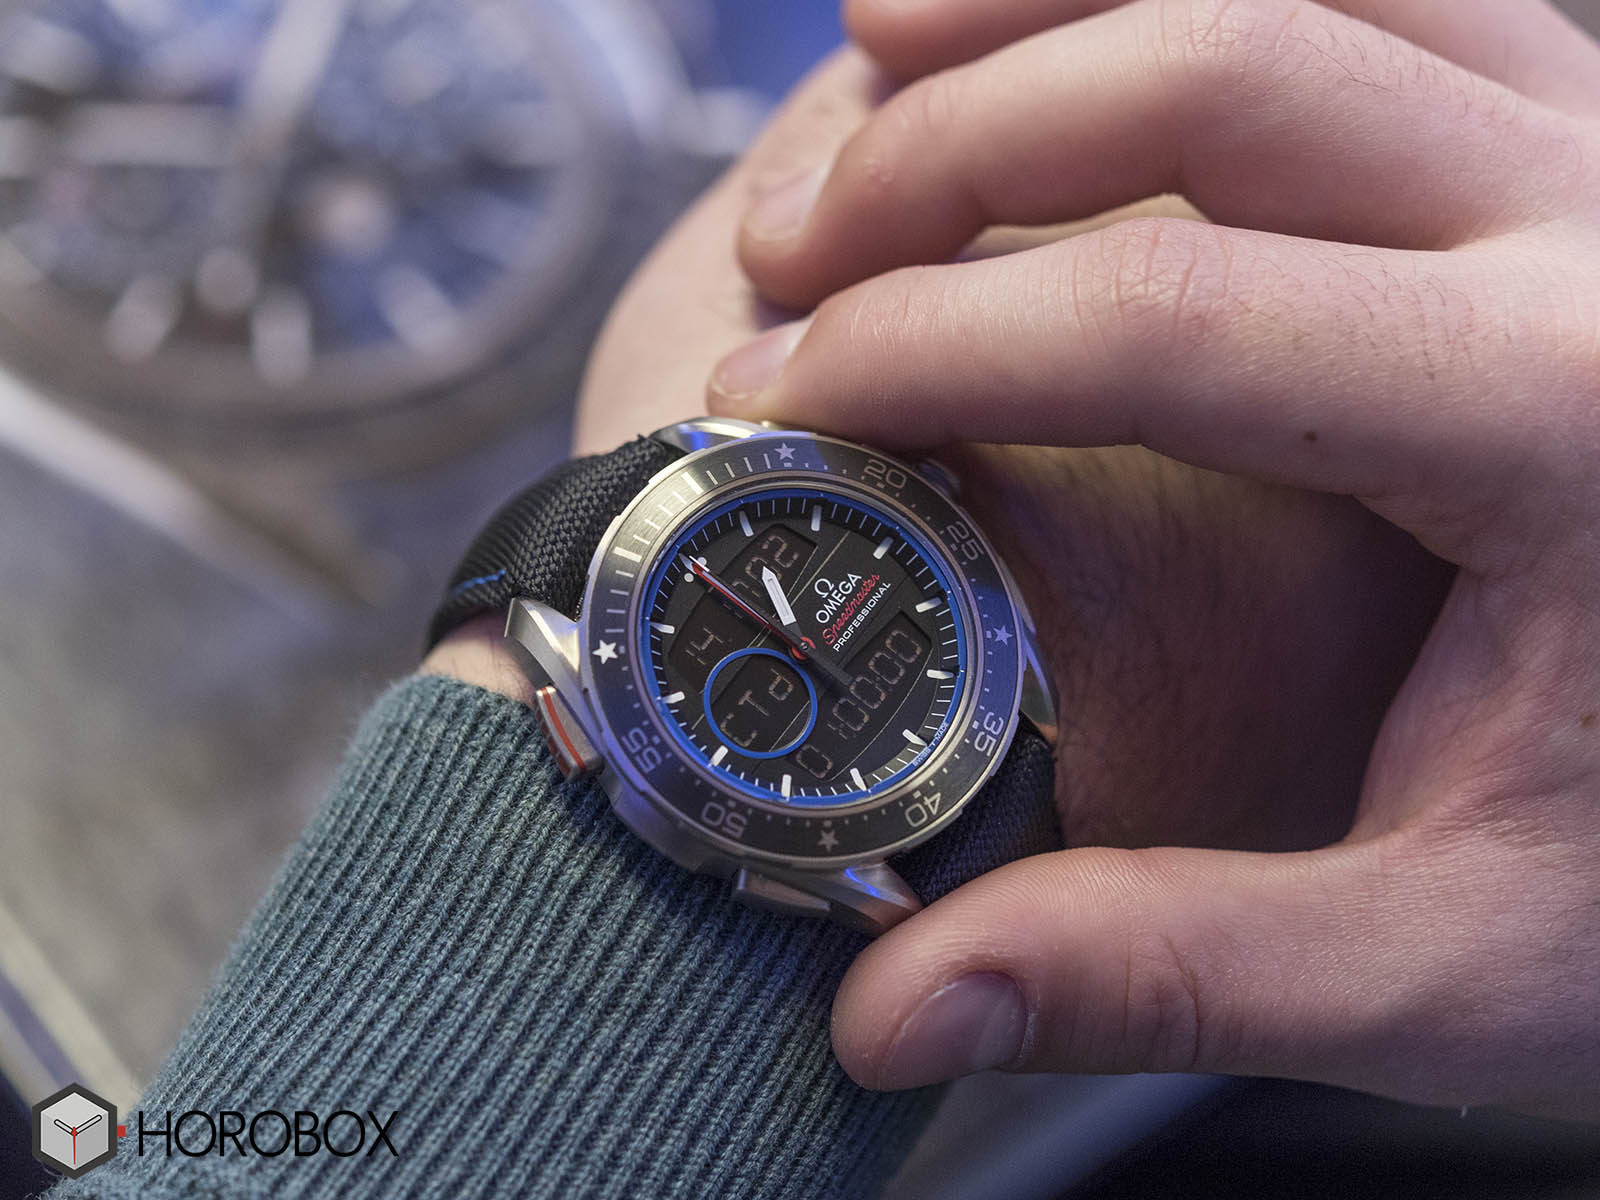 omega-speedmaster-x-33-regatta-chronograph-318-92-45-79-01-001-9-.jpg